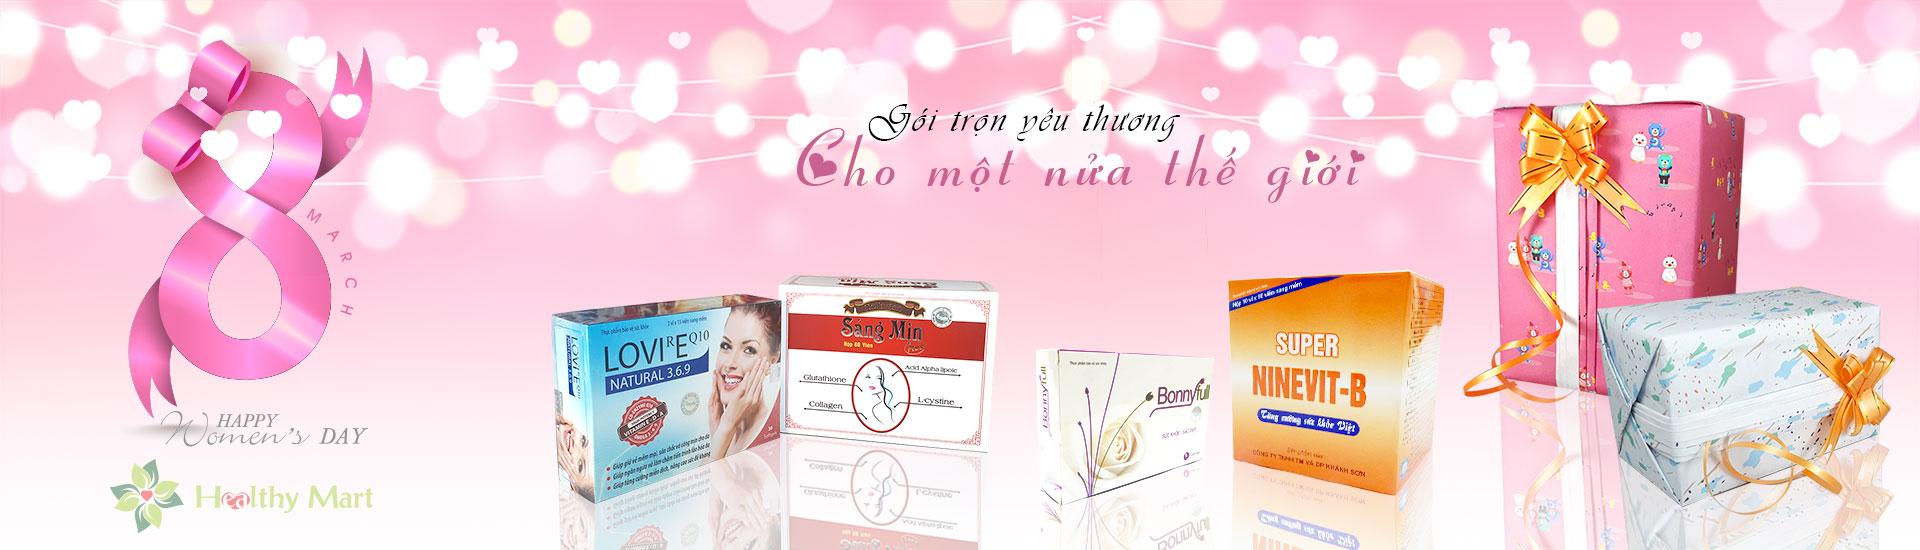 Healthy Mart-Giang Sinh Ve Qua Tran Tre-PubokidGold